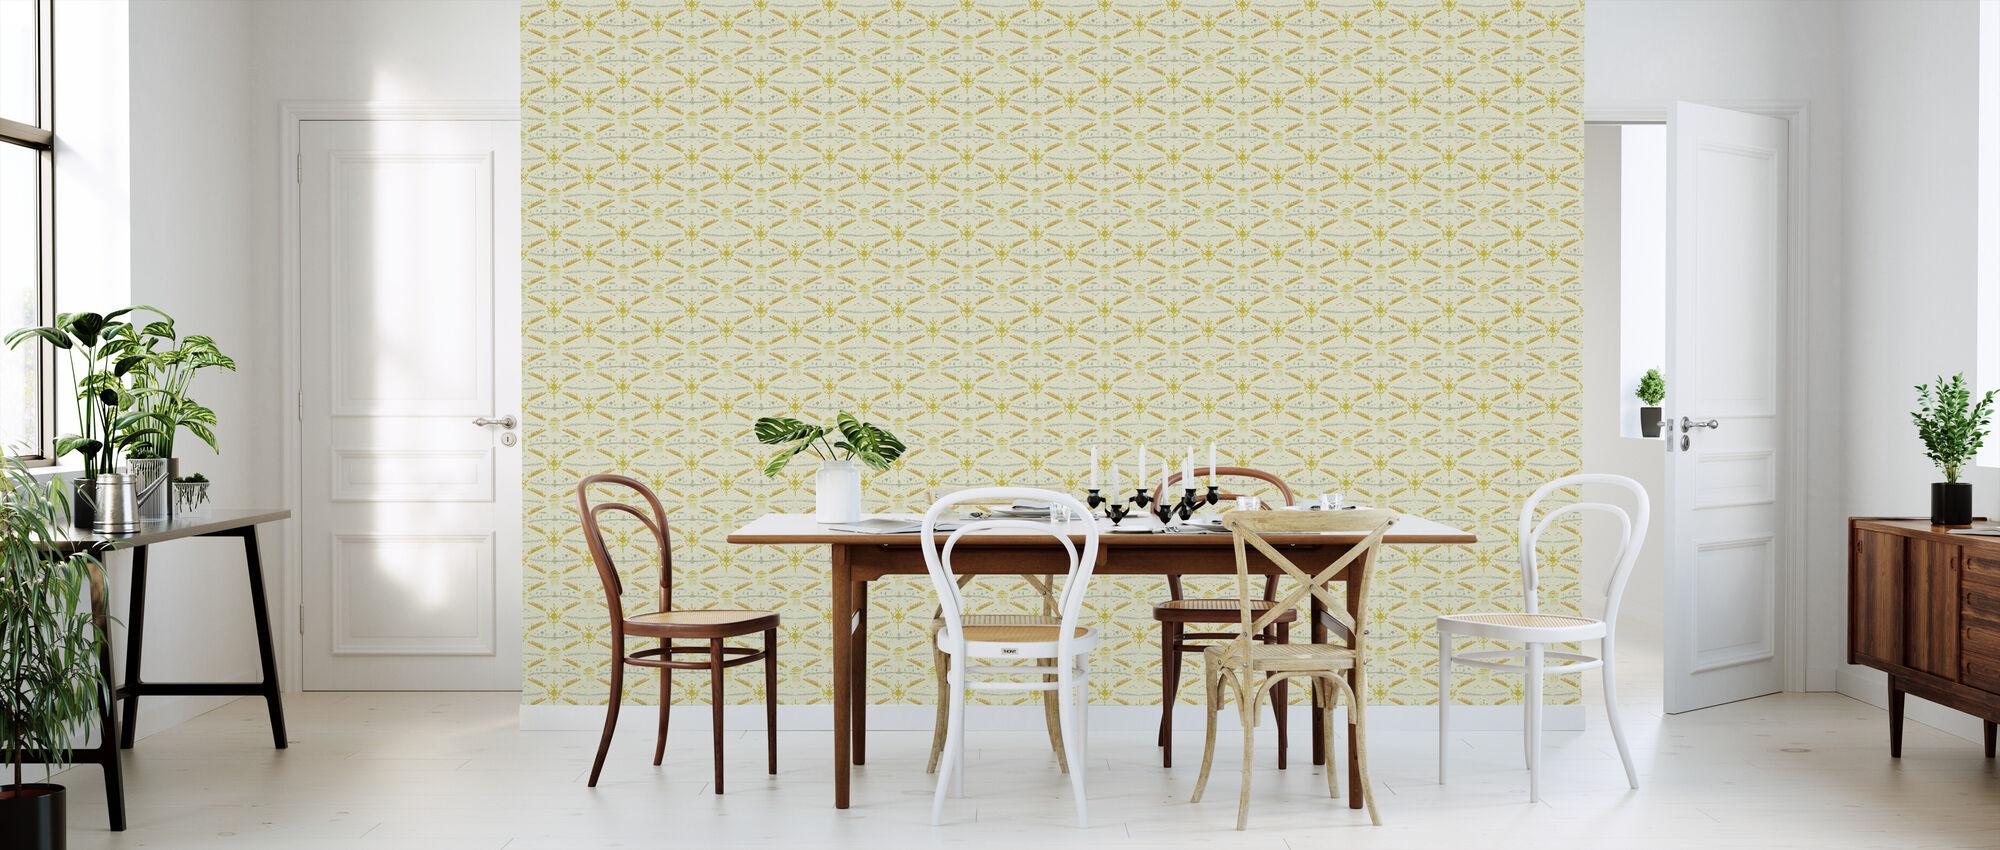 Colorform Yellow - Wallpaper - Kitchen